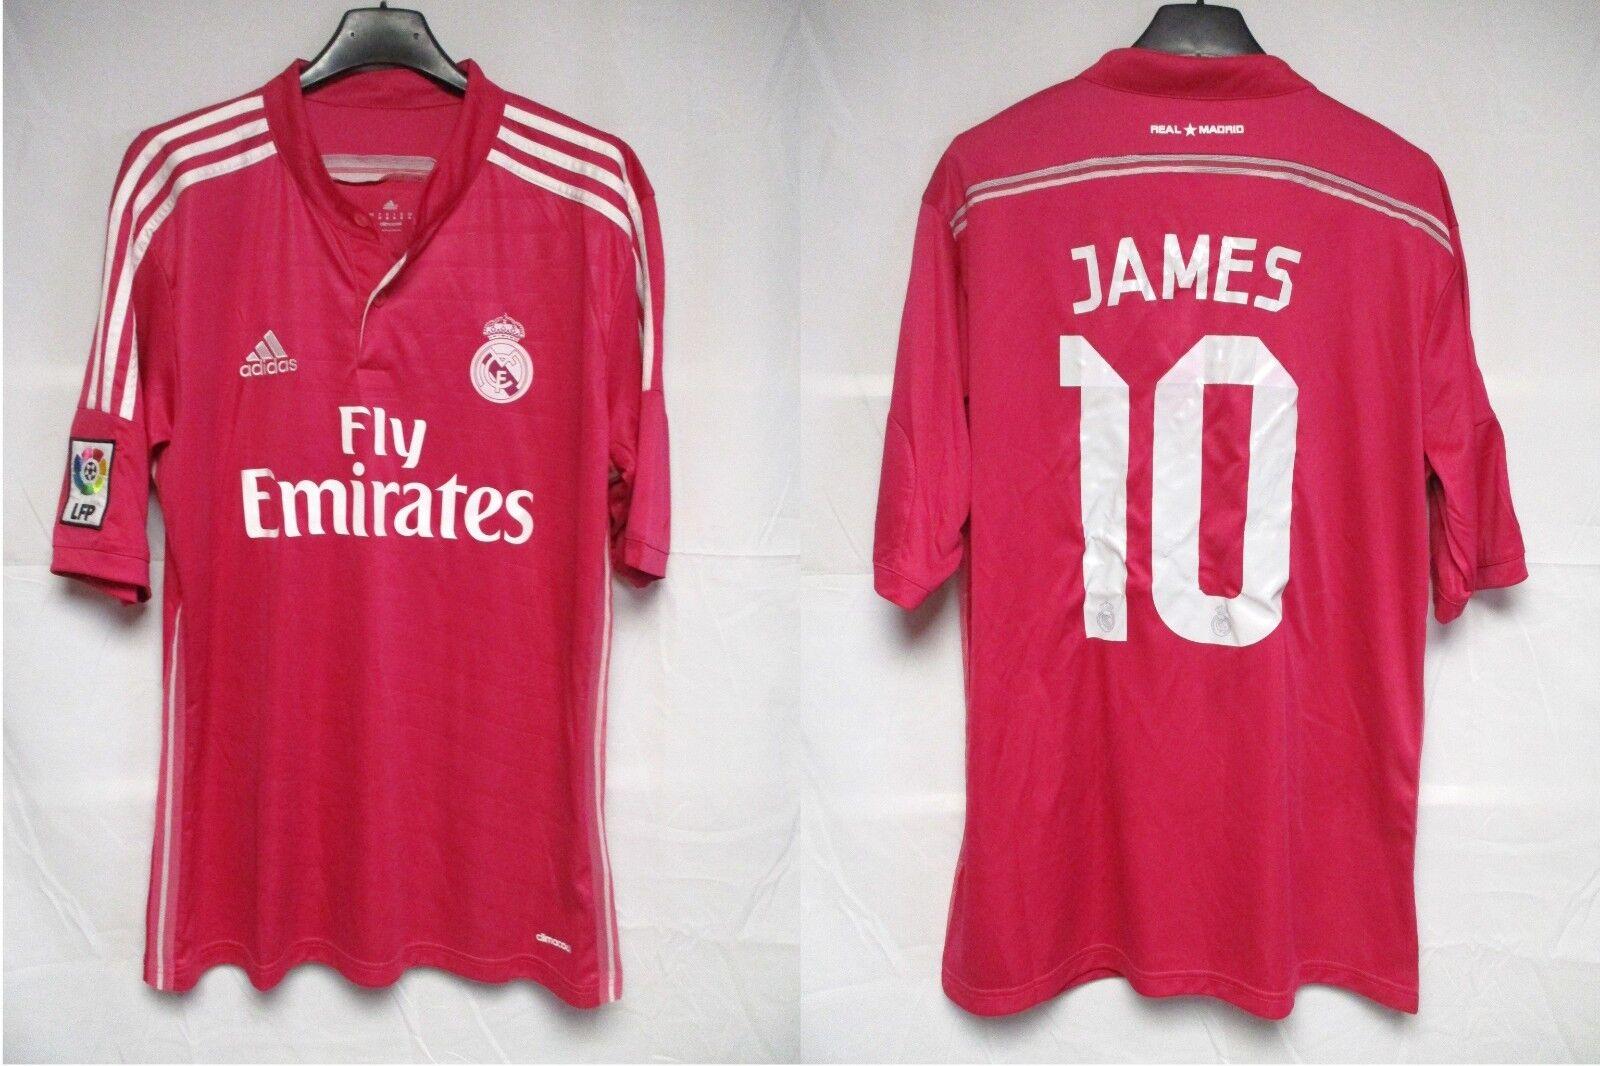 Maillot REAL MADRID 2015 away ADIDAS camiseta shirt jersey JAMES RODRIGUEZ 10 M